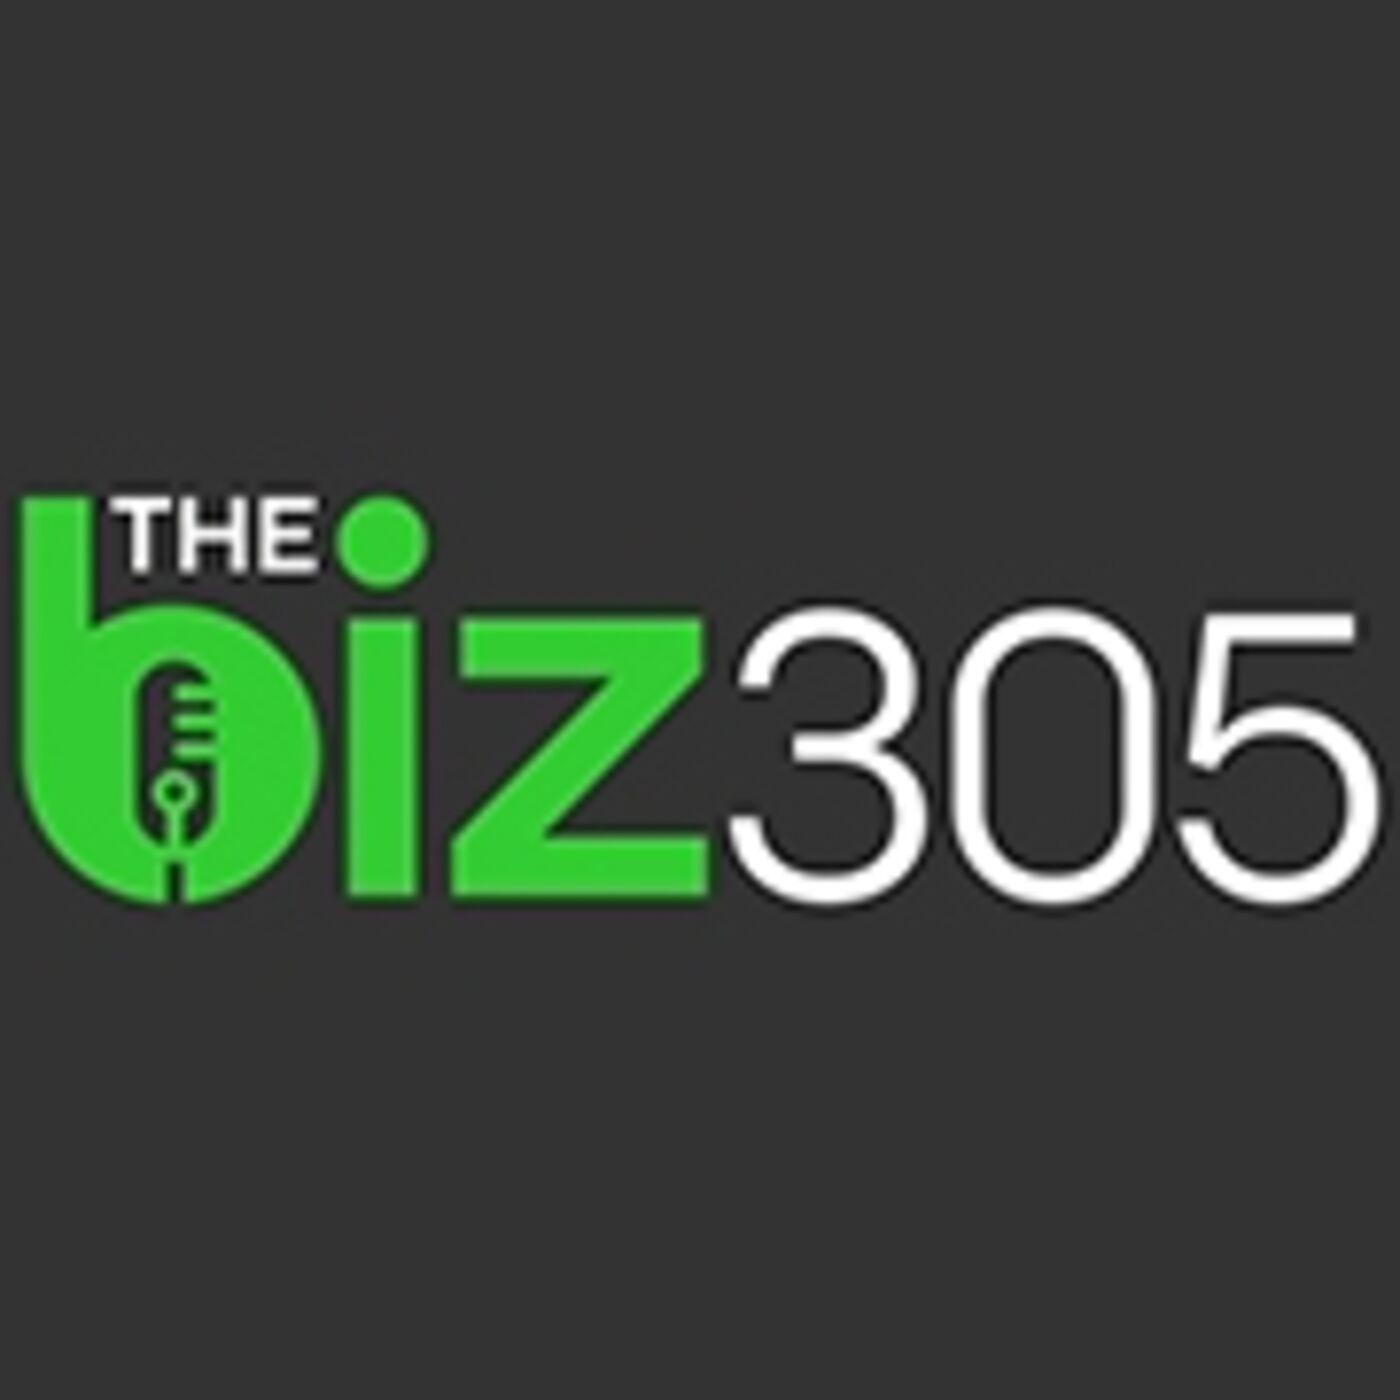 BIZ 305 features SMI Capital Funding - Scott Mees   Whilly Bermudez